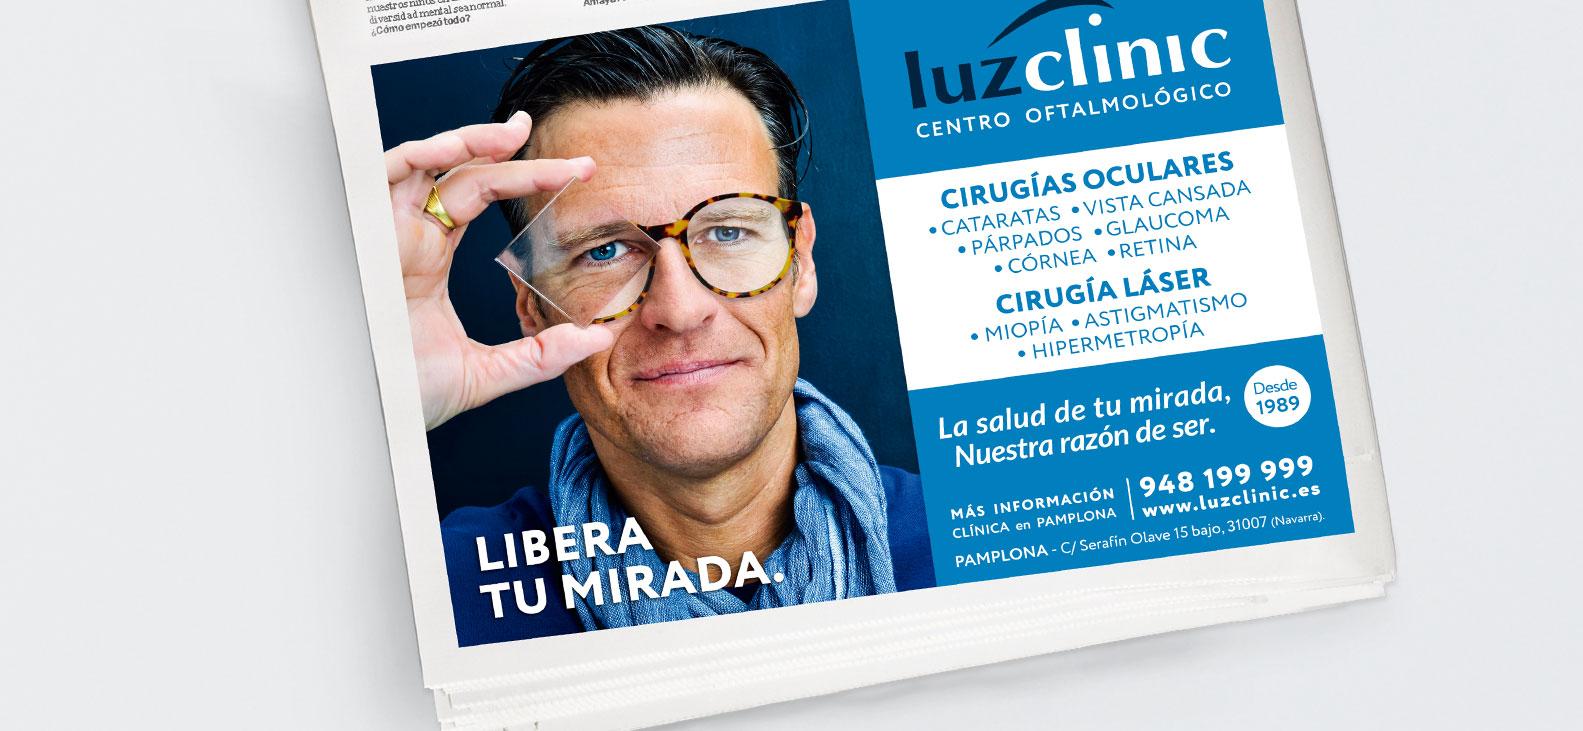 LUZCLINIC – Centros oftalmológicos